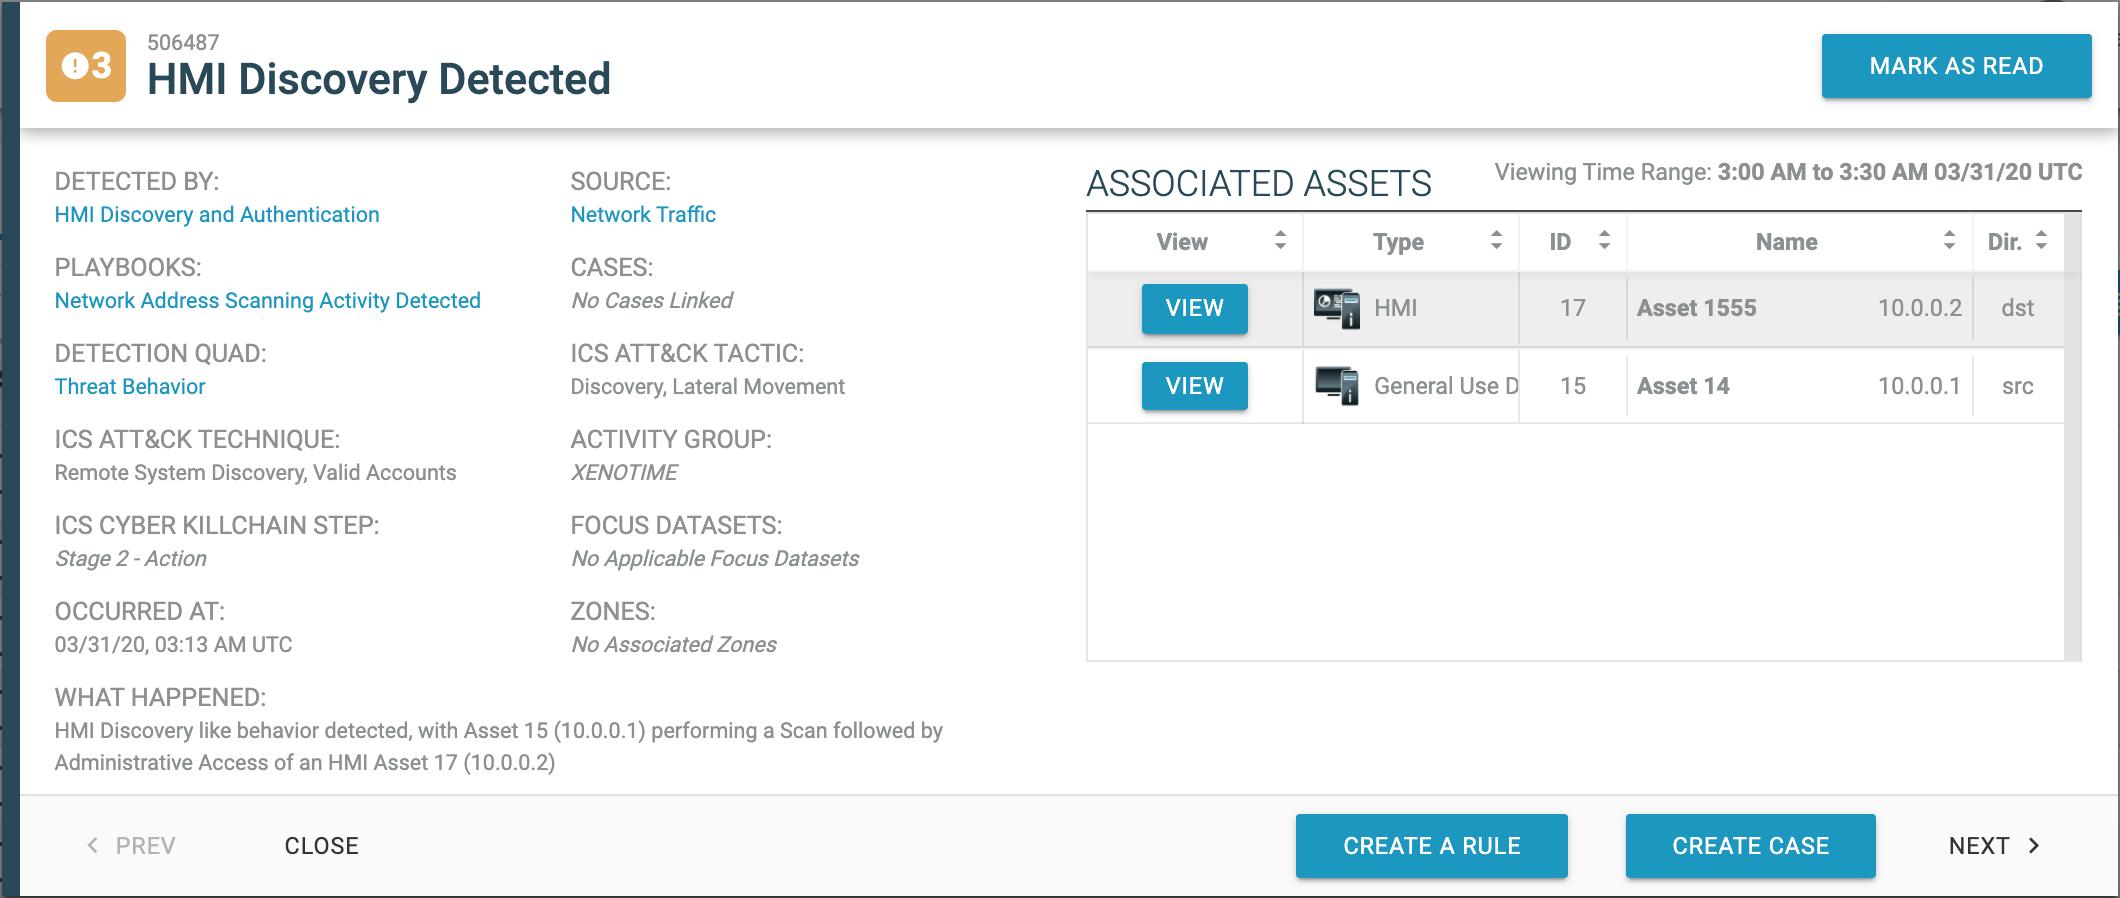 HMI Discovery Detected screenshot